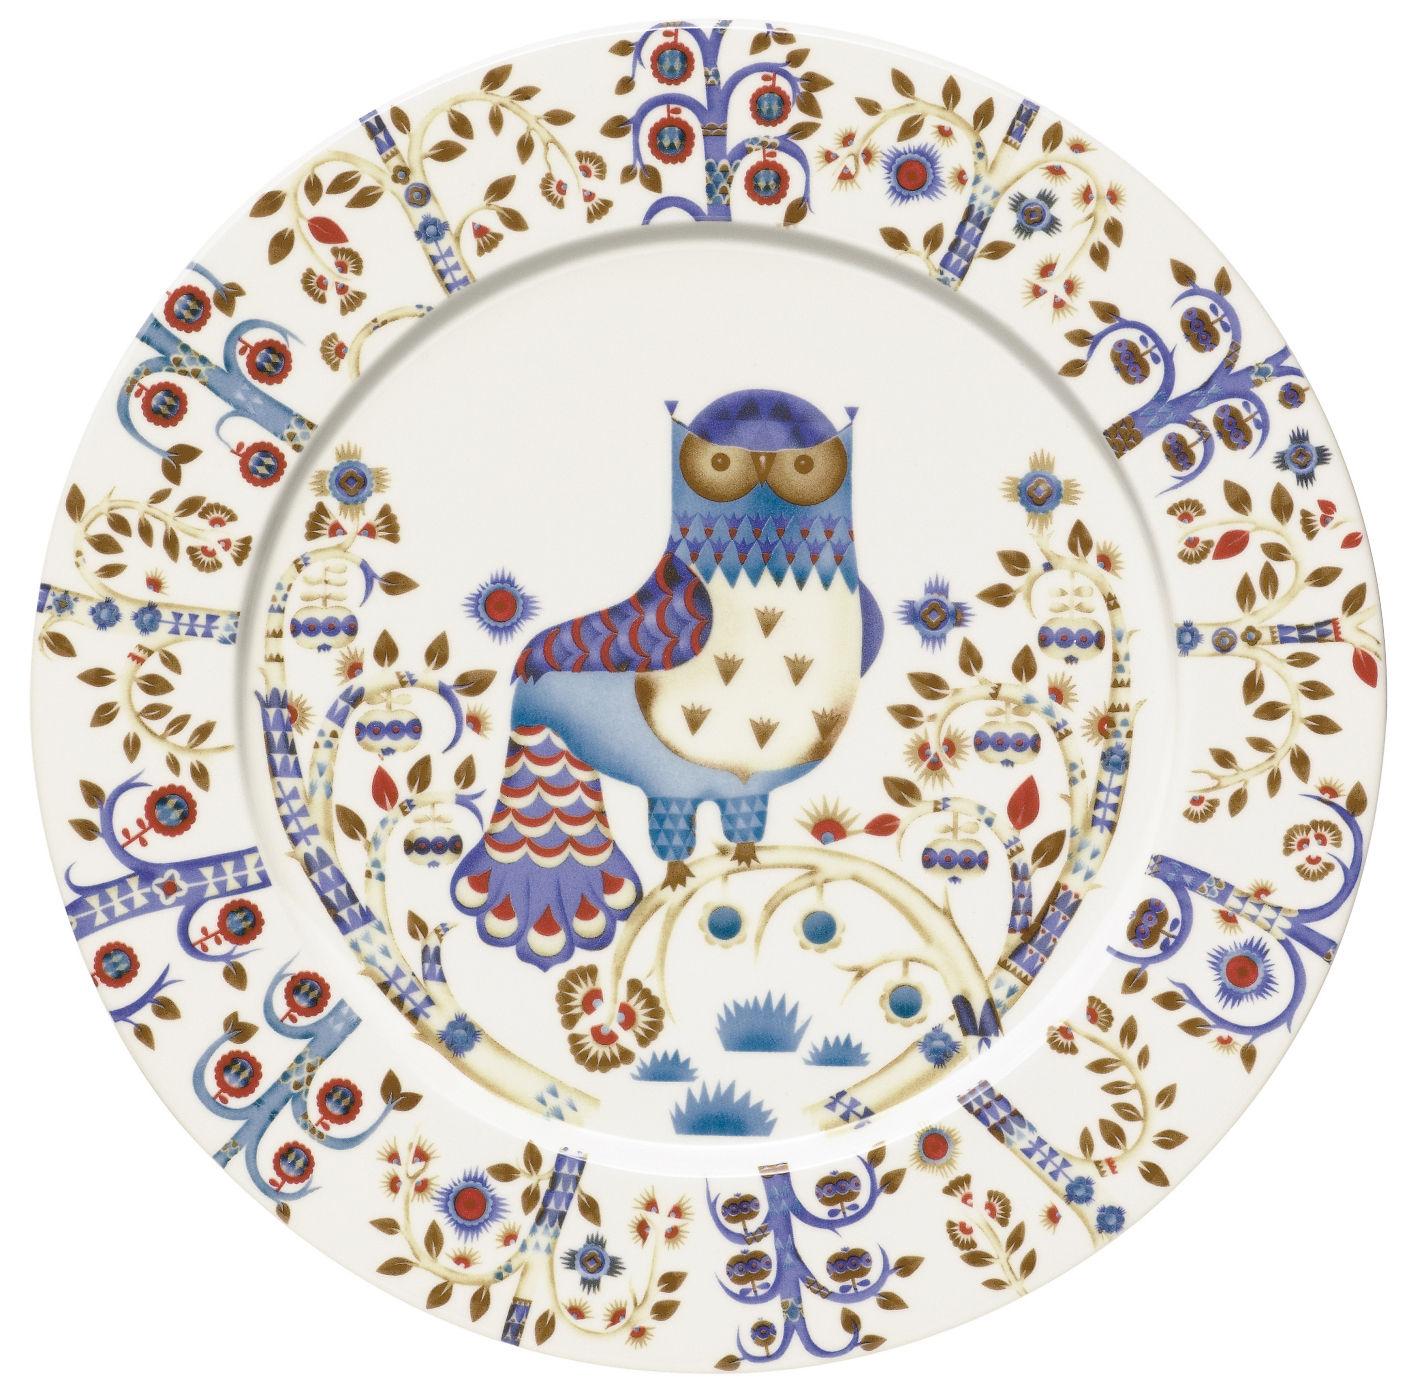 Tischkultur - Teller - Taika Teller - Iittala - Weißer Hintergrund - Keramik